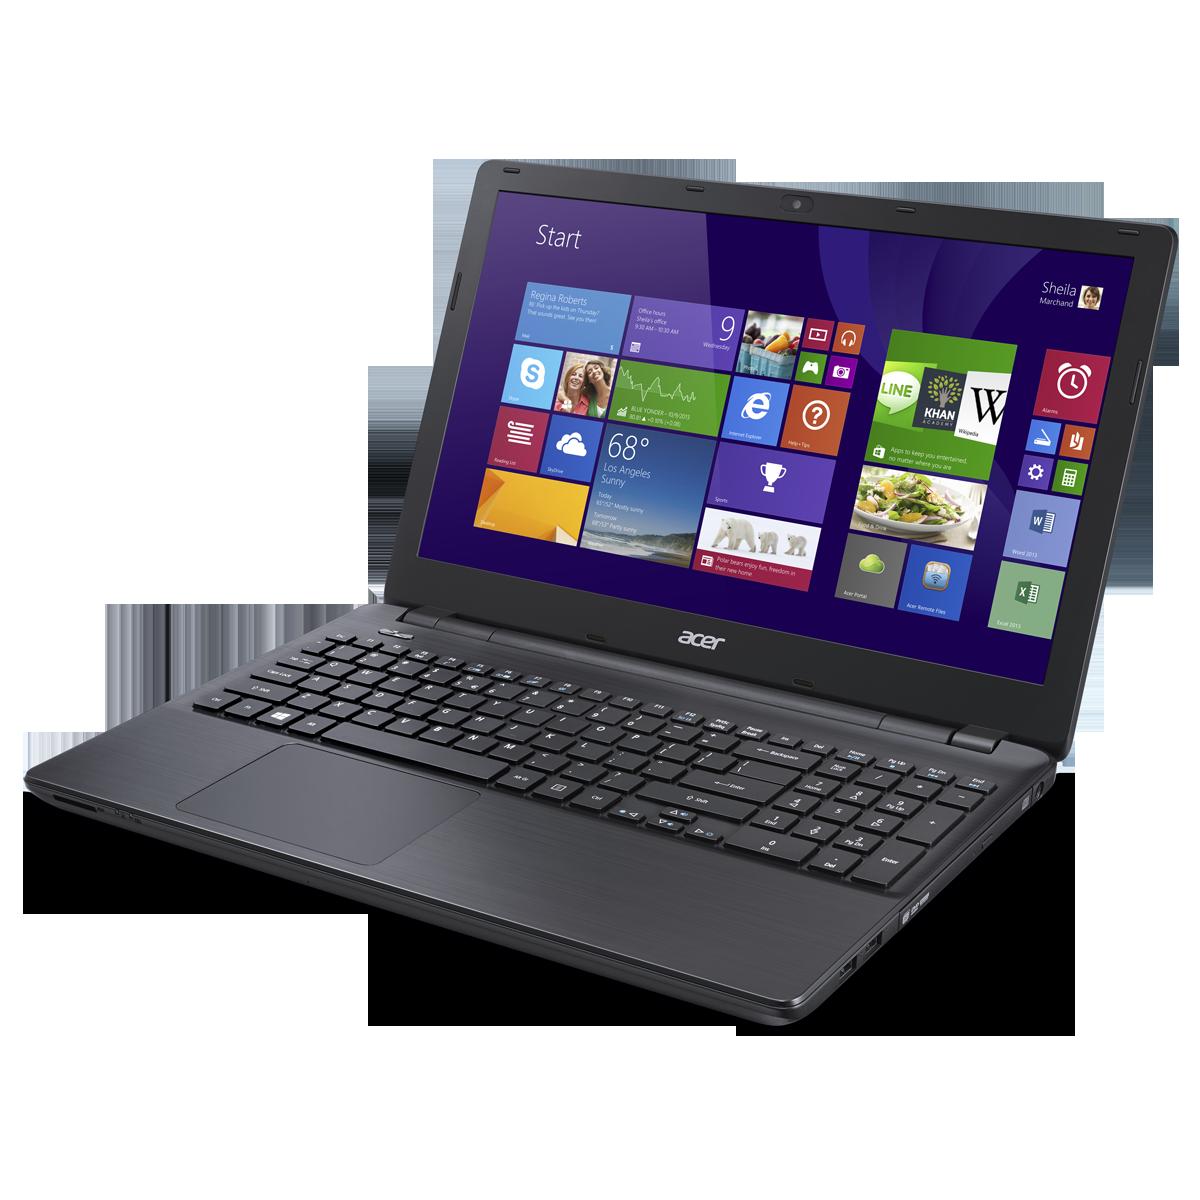 Acer Aspire E5-521 Realtek LAN Treiber Windows XP